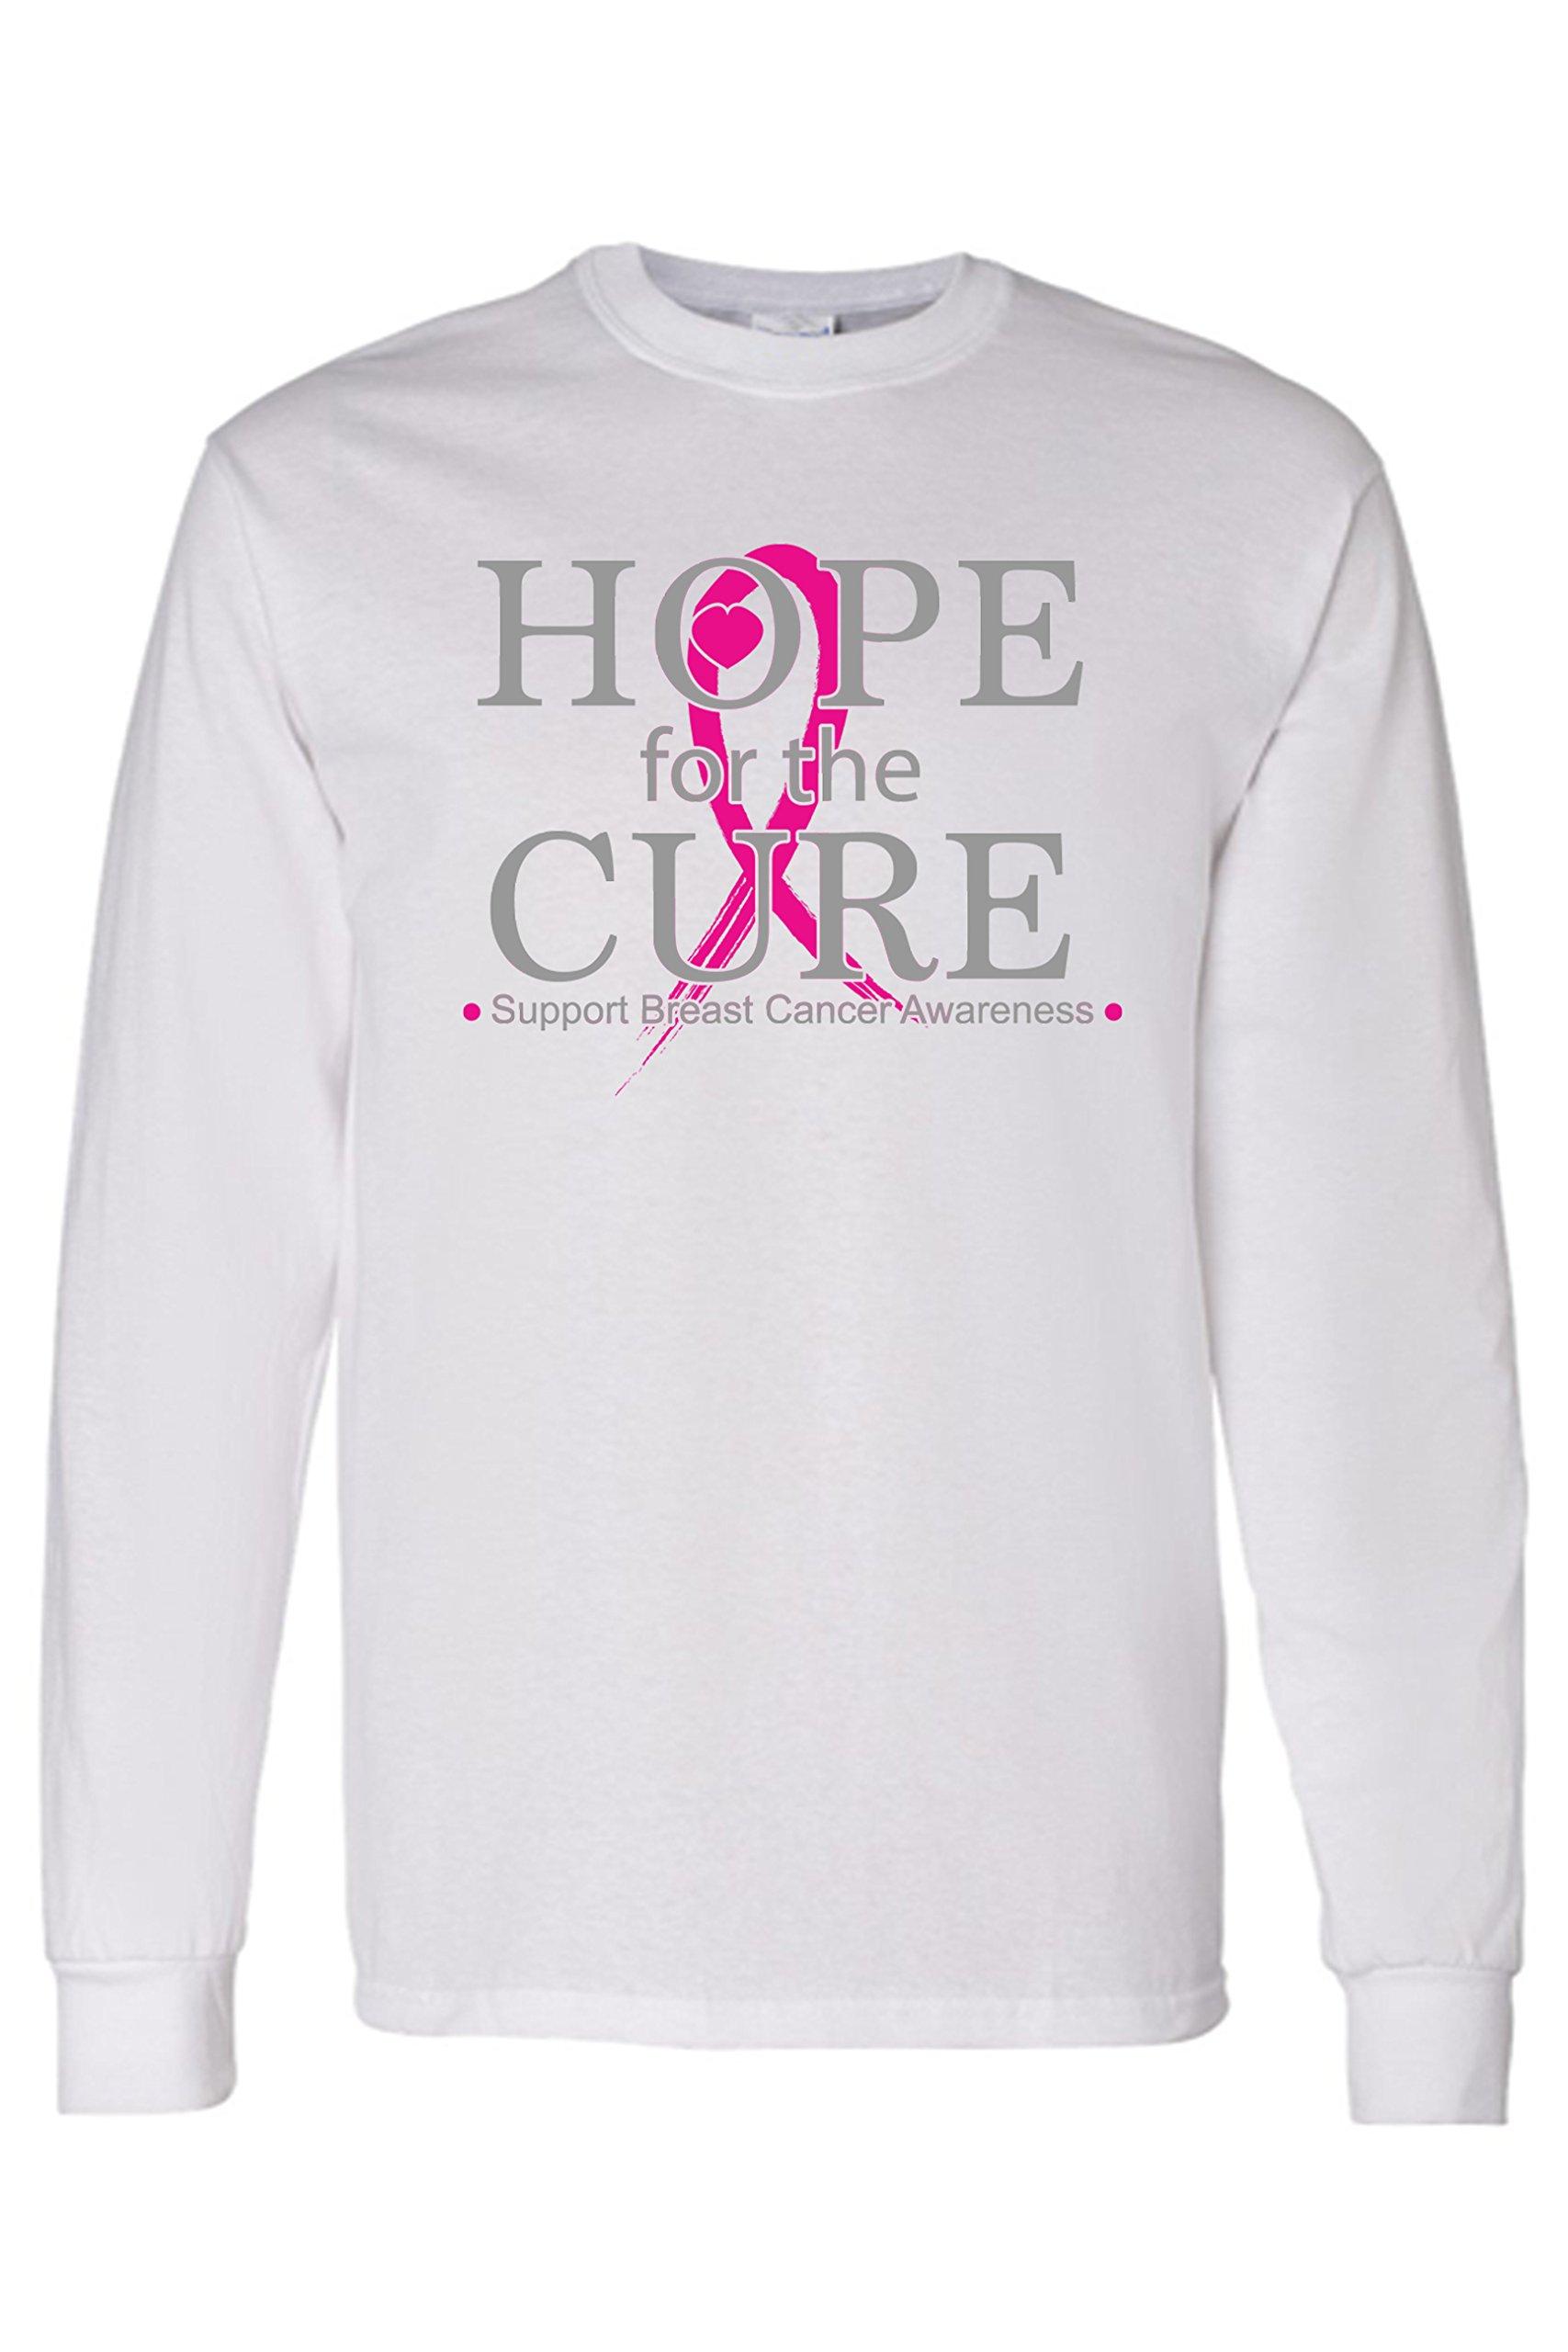 Shore Trendz S Unisex Hope For The Curebreast Cancer Awareness Shirt